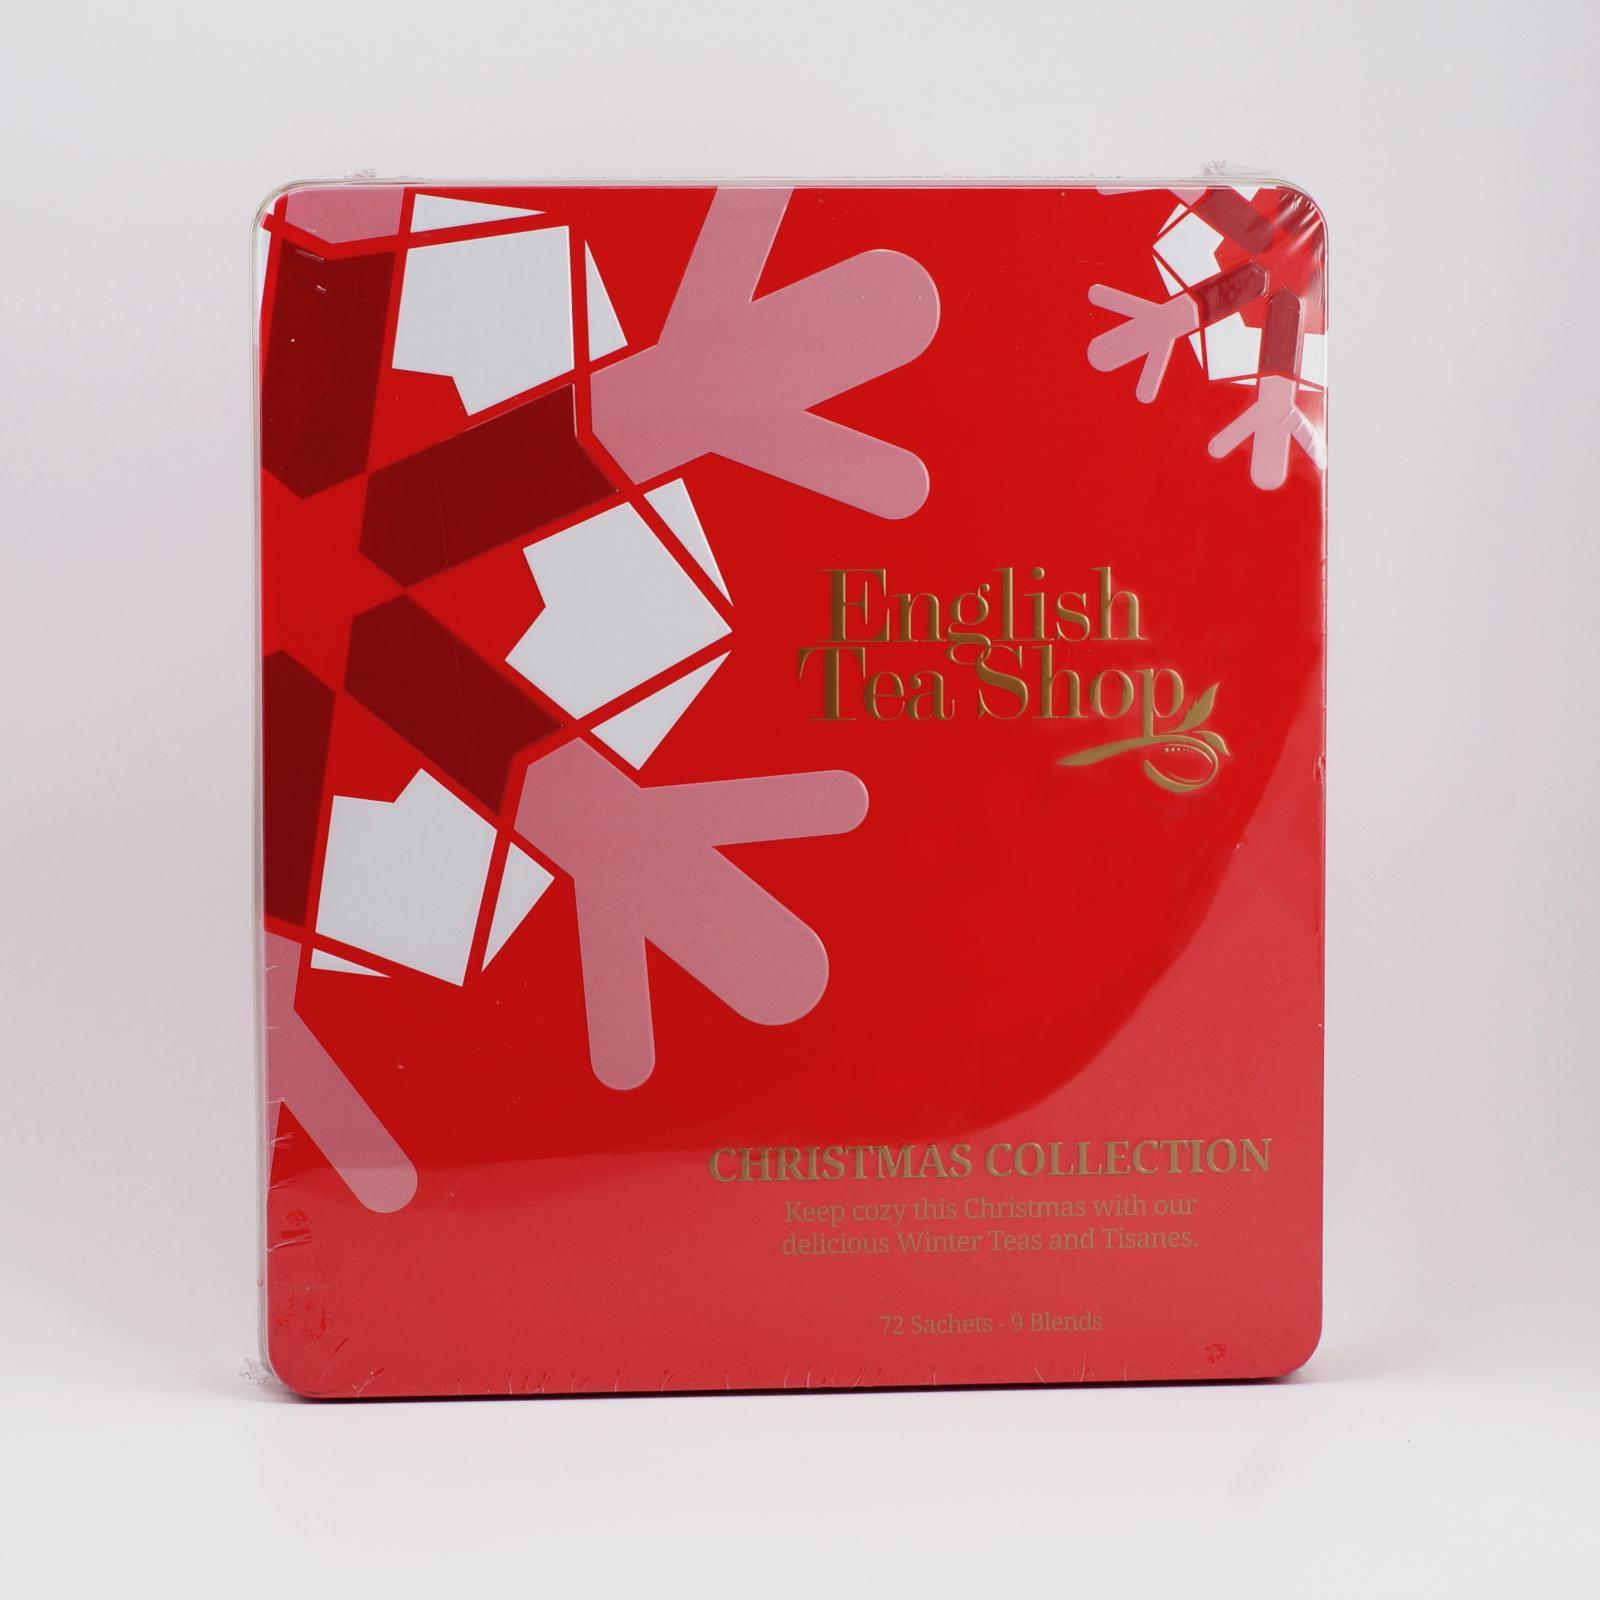 English Tea Shop Červené Vánoce, plechová kazeta 72 ks, 108 g